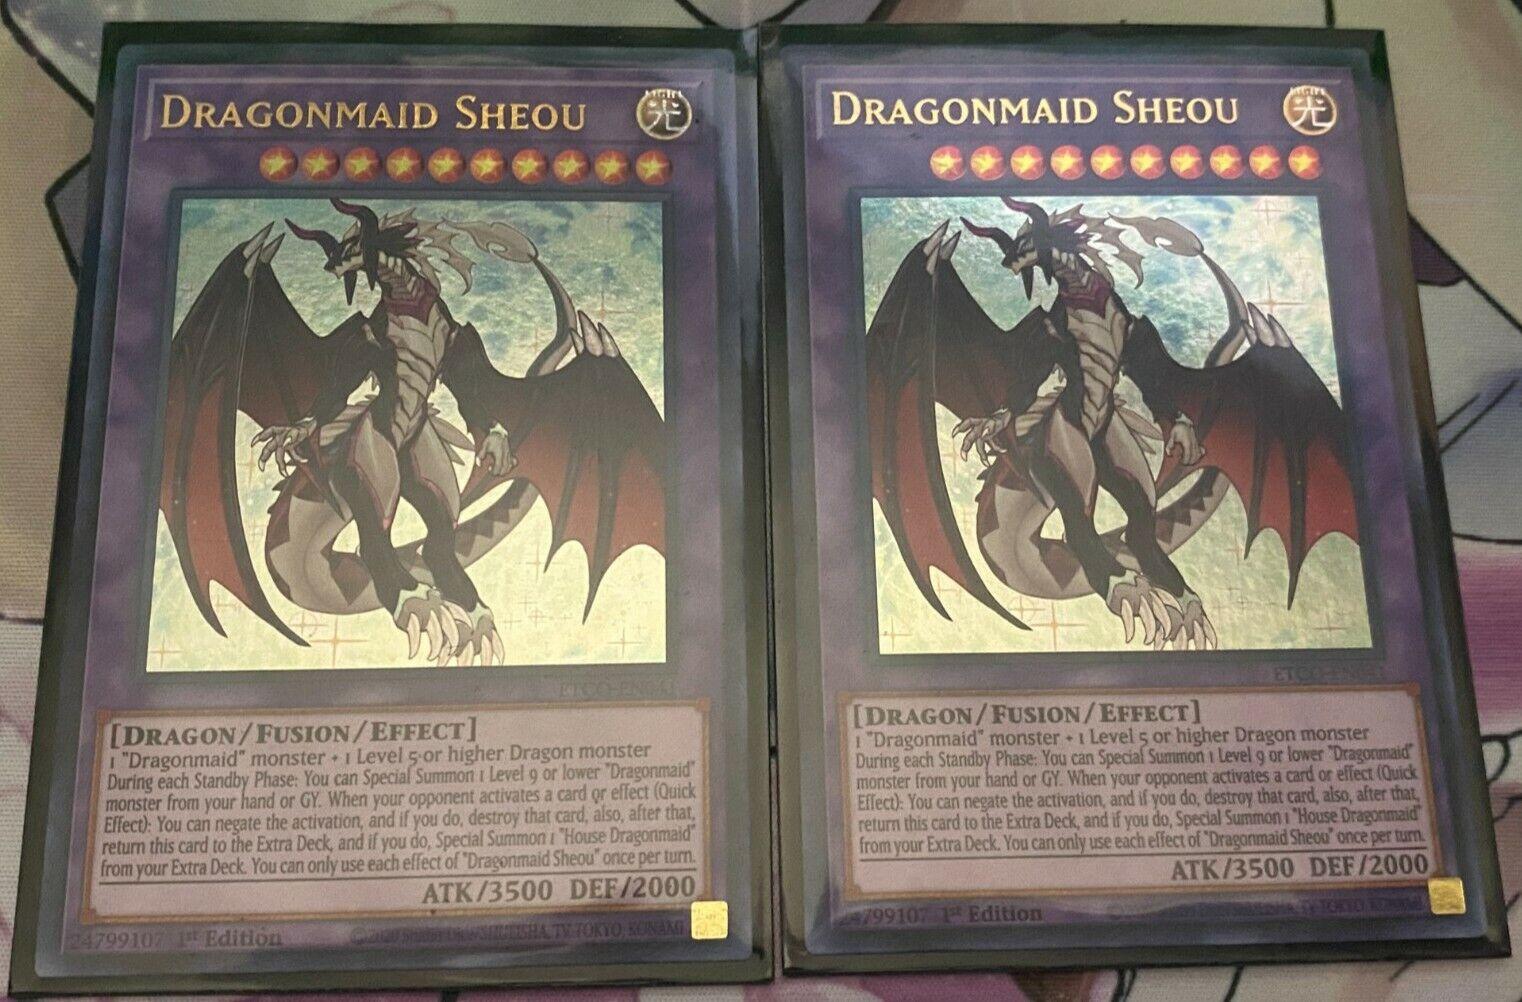 Yugioh 2X Dragonmaid Sheou - $12.00